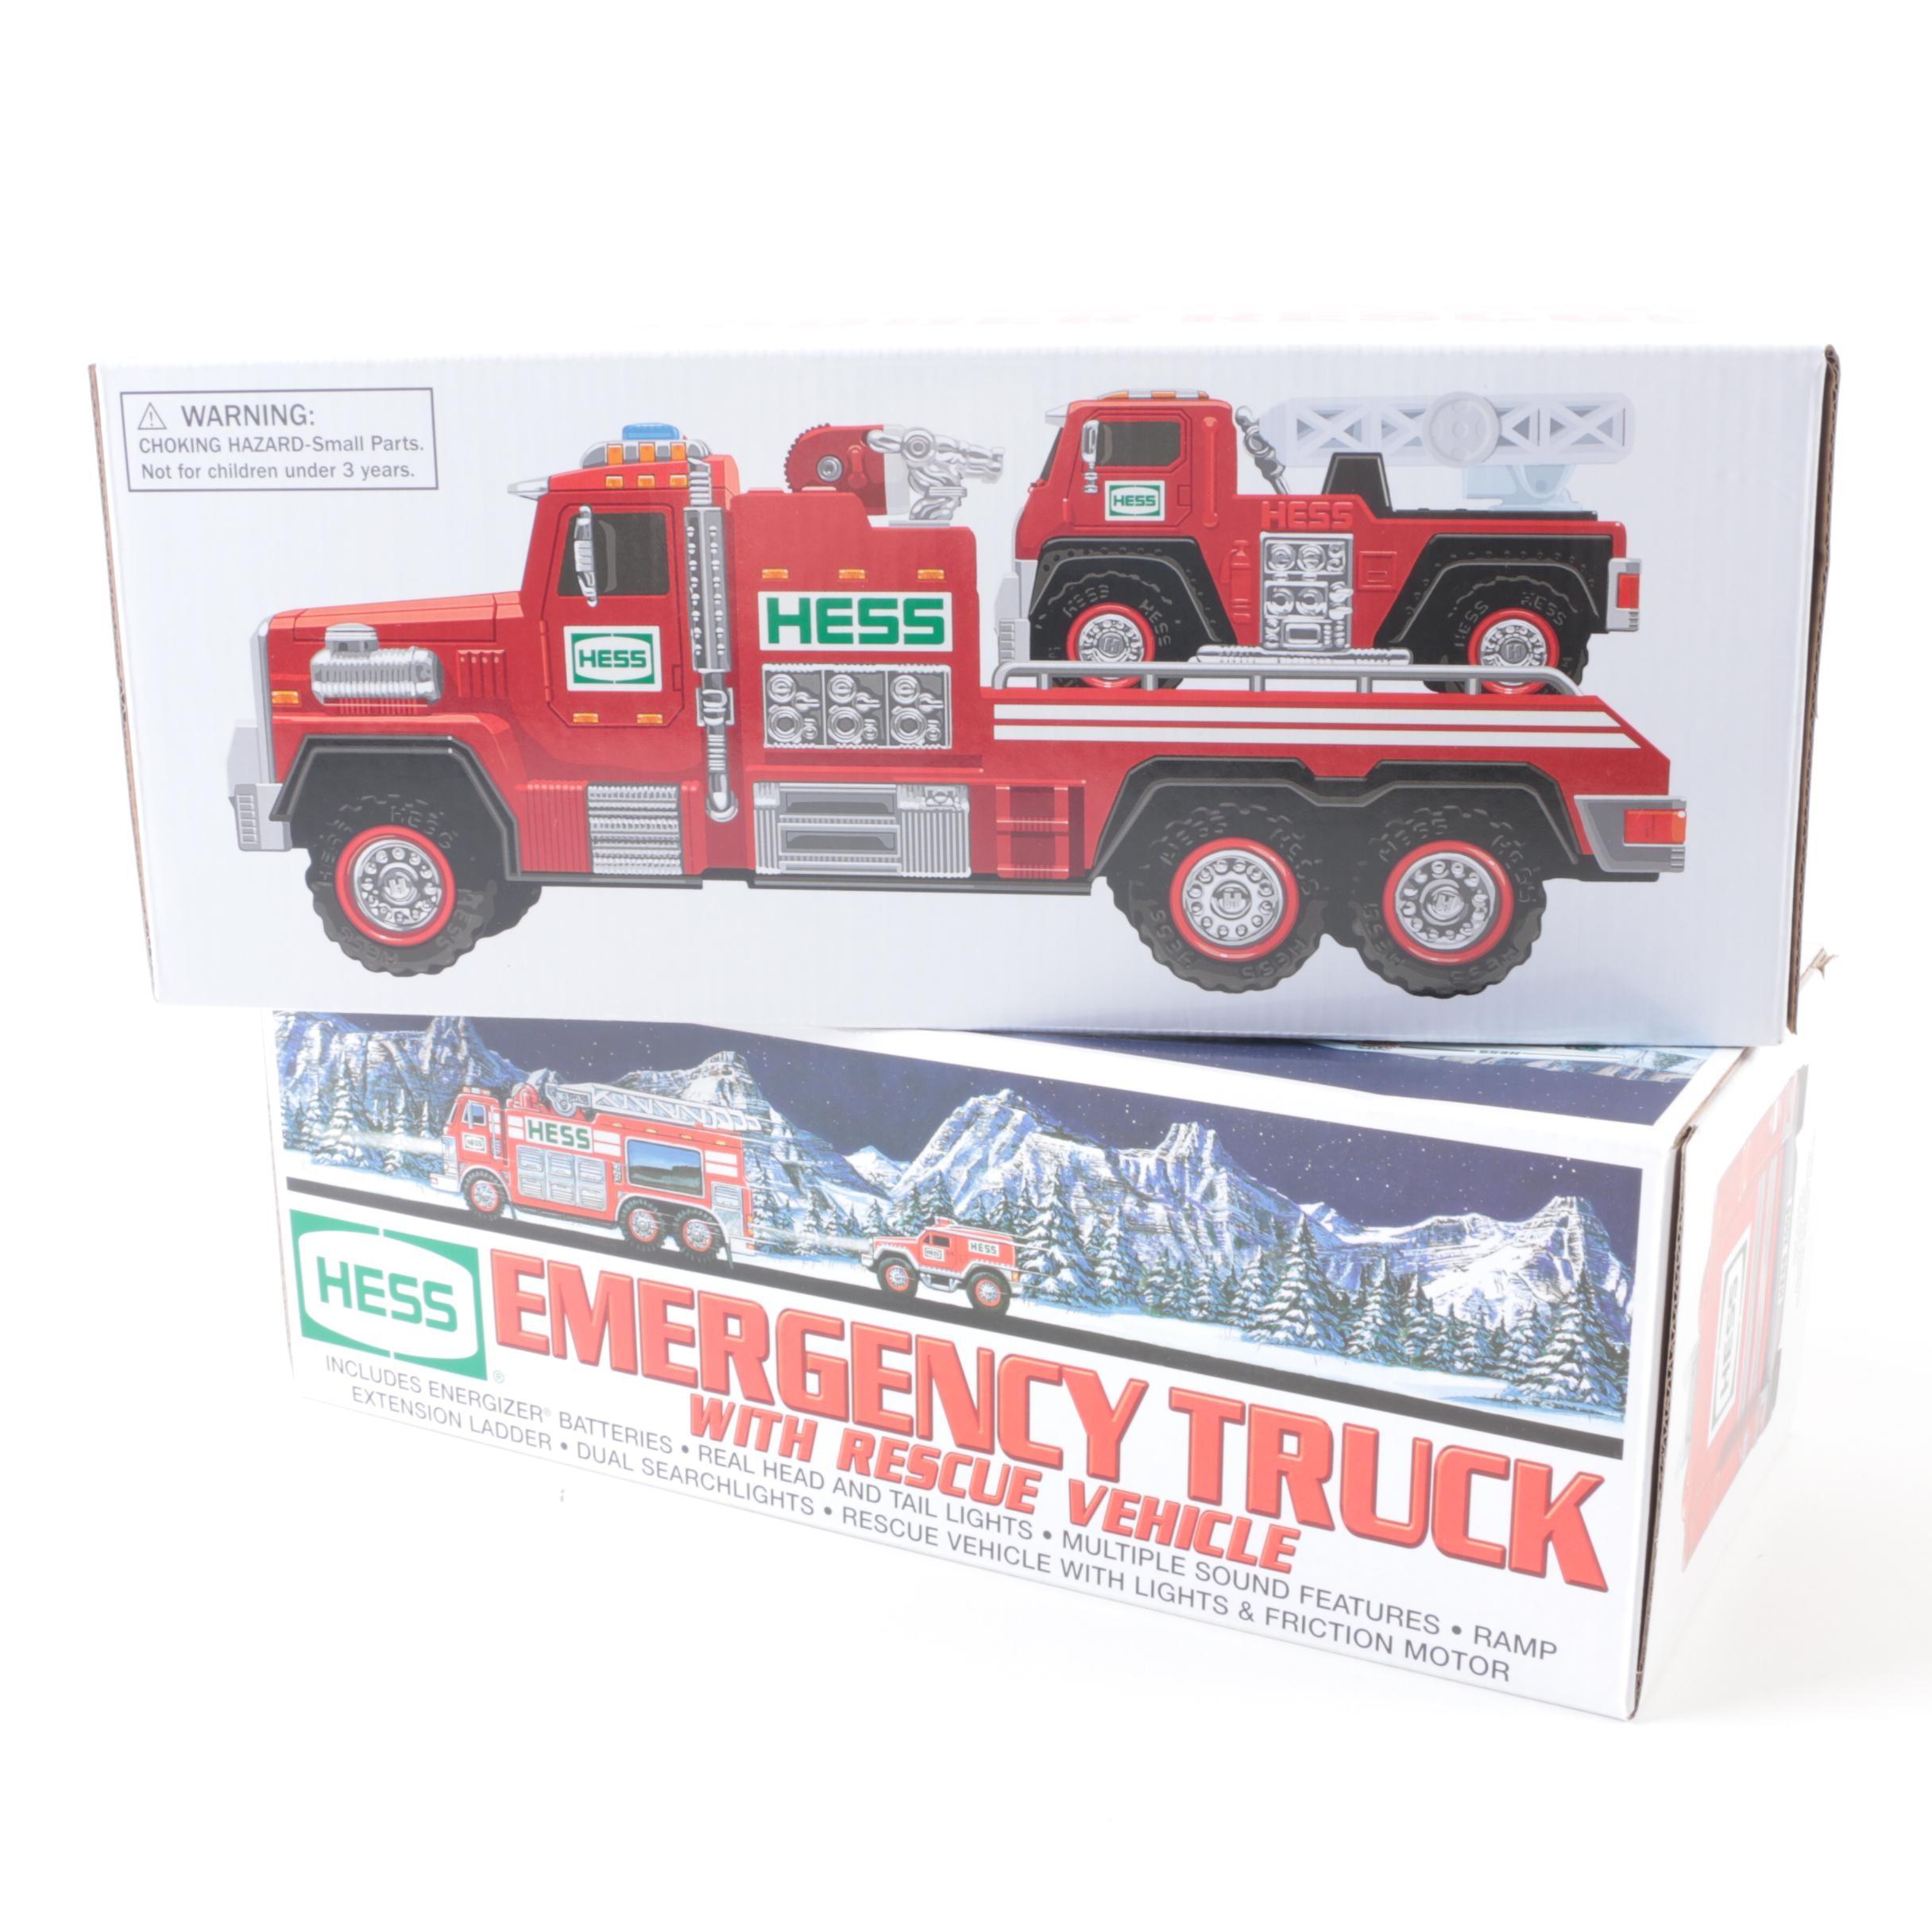 Two Hess Trucks